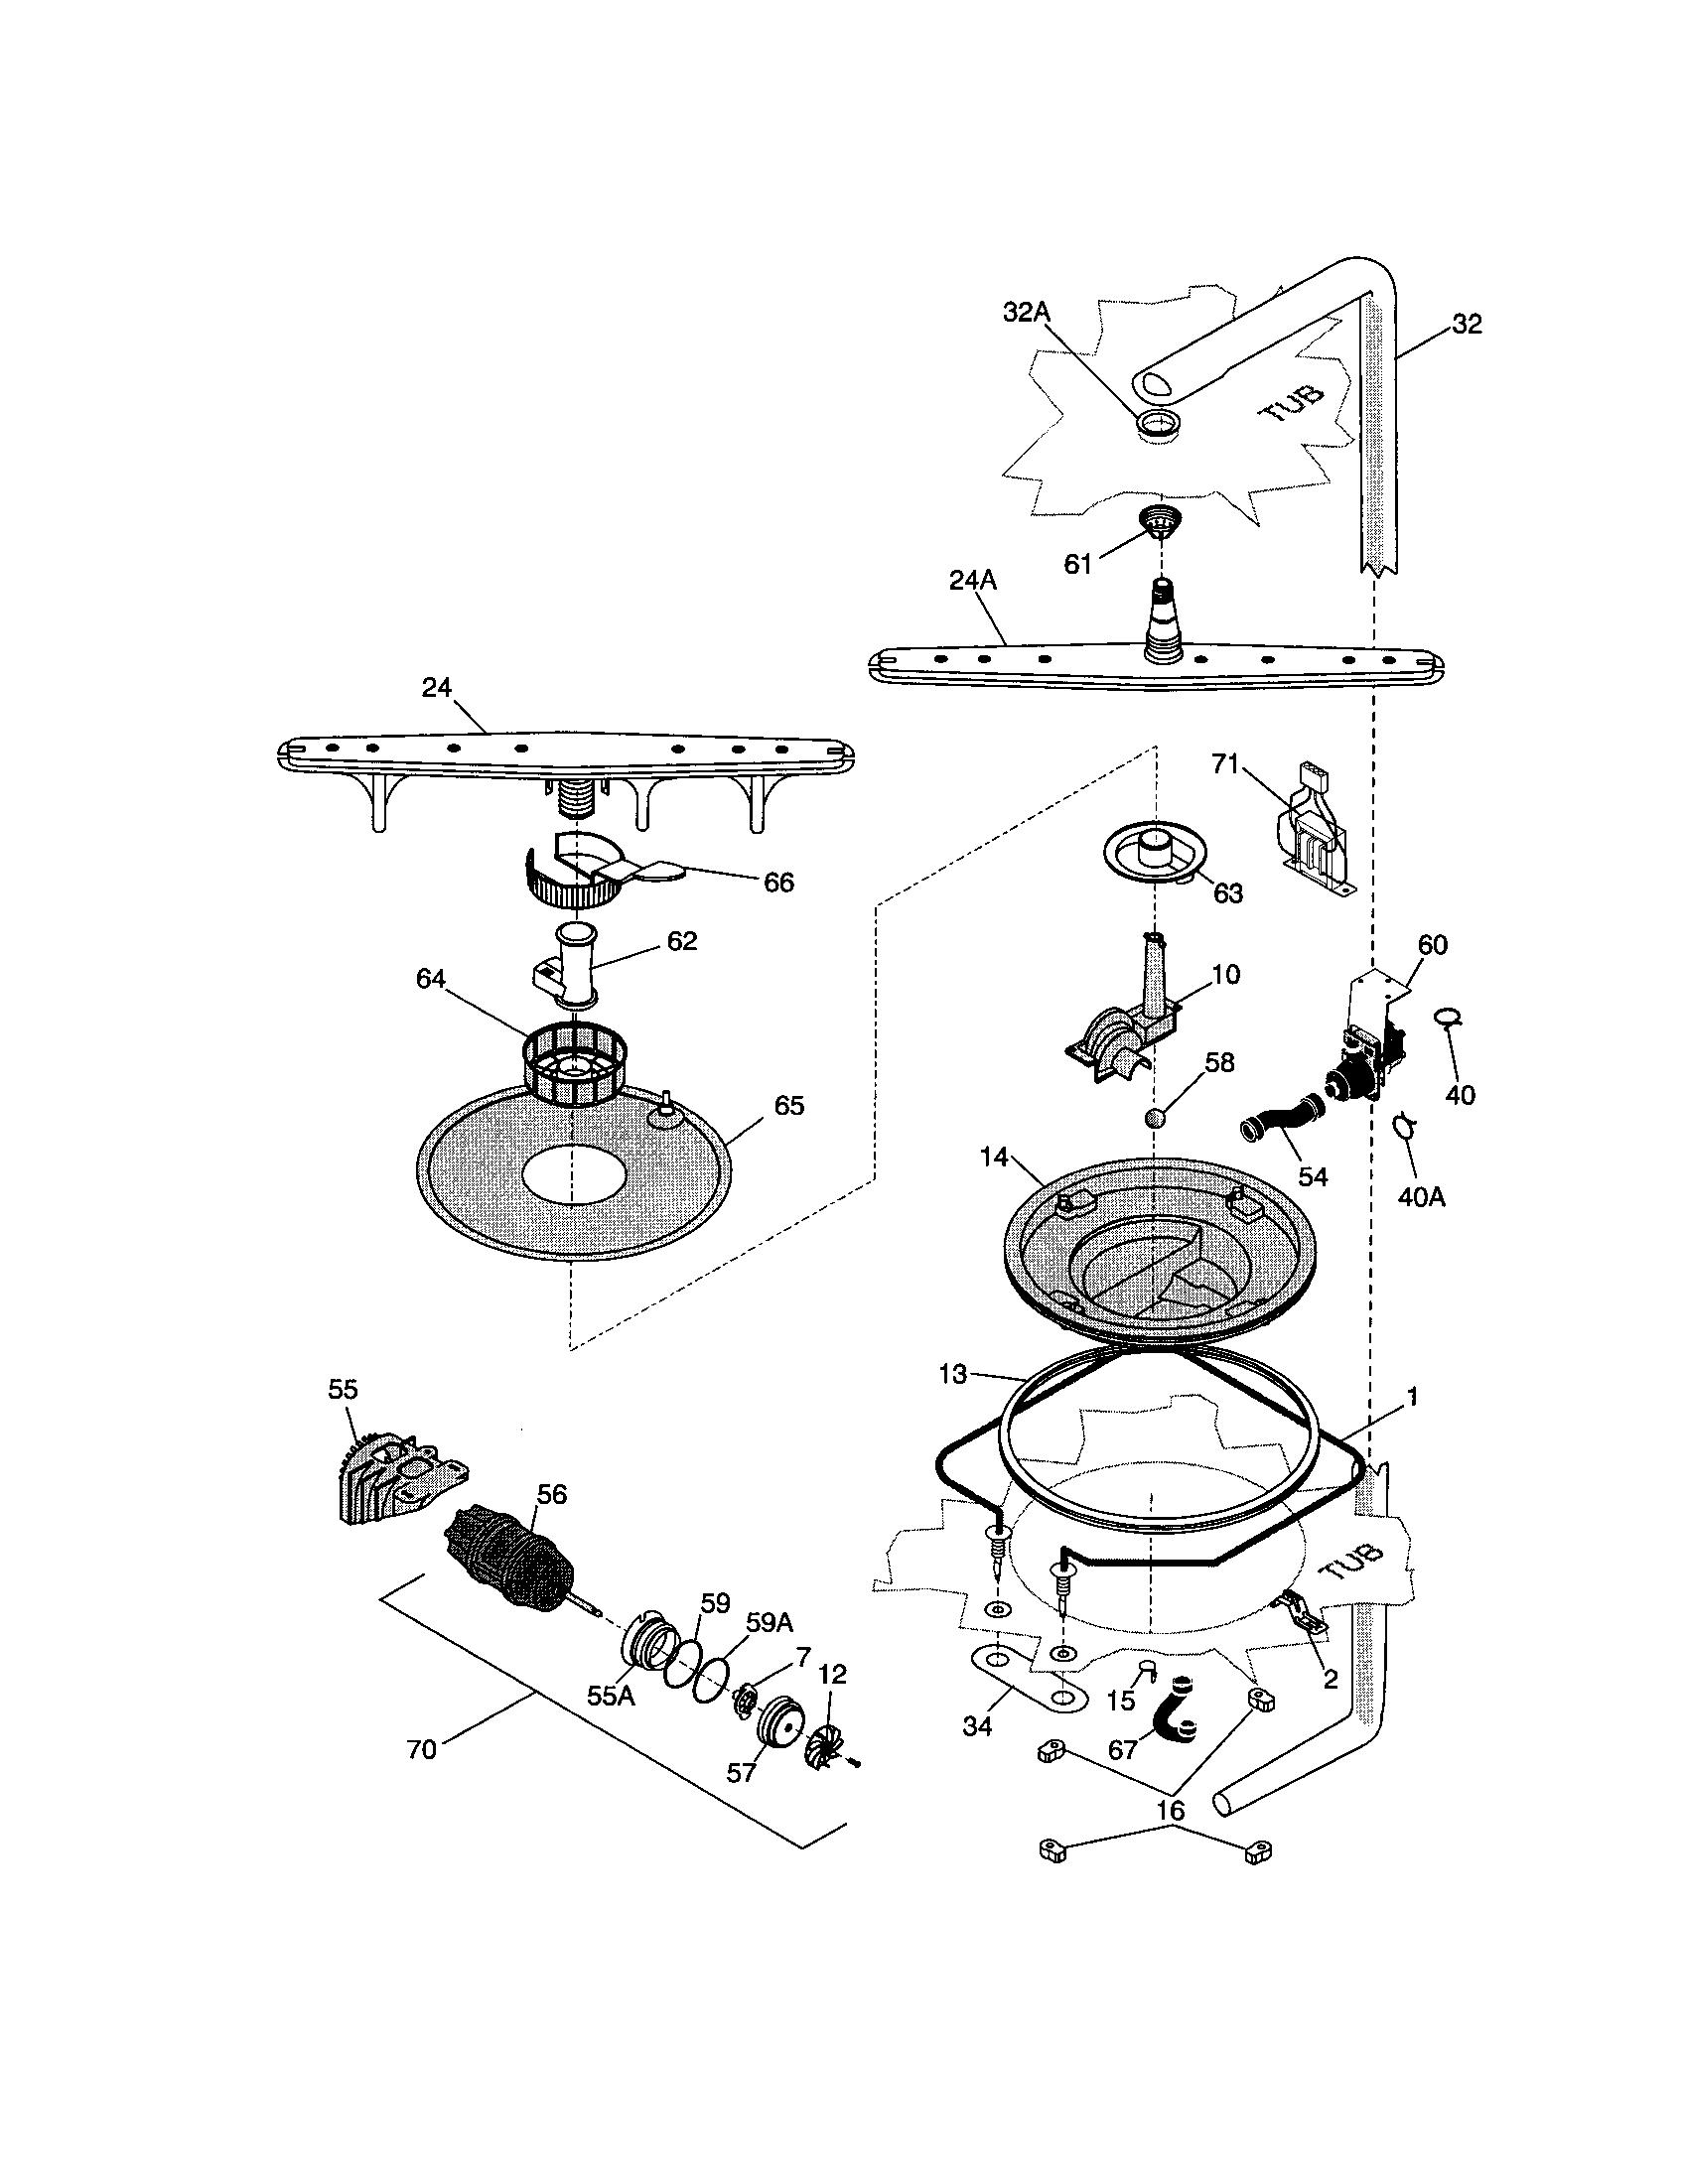 FN_7303] Frigidaire Dishwasher Schematic Diagram Free DiagramItis Stre Over Marki Xolia Mohammedshrine Librar Wiring 101